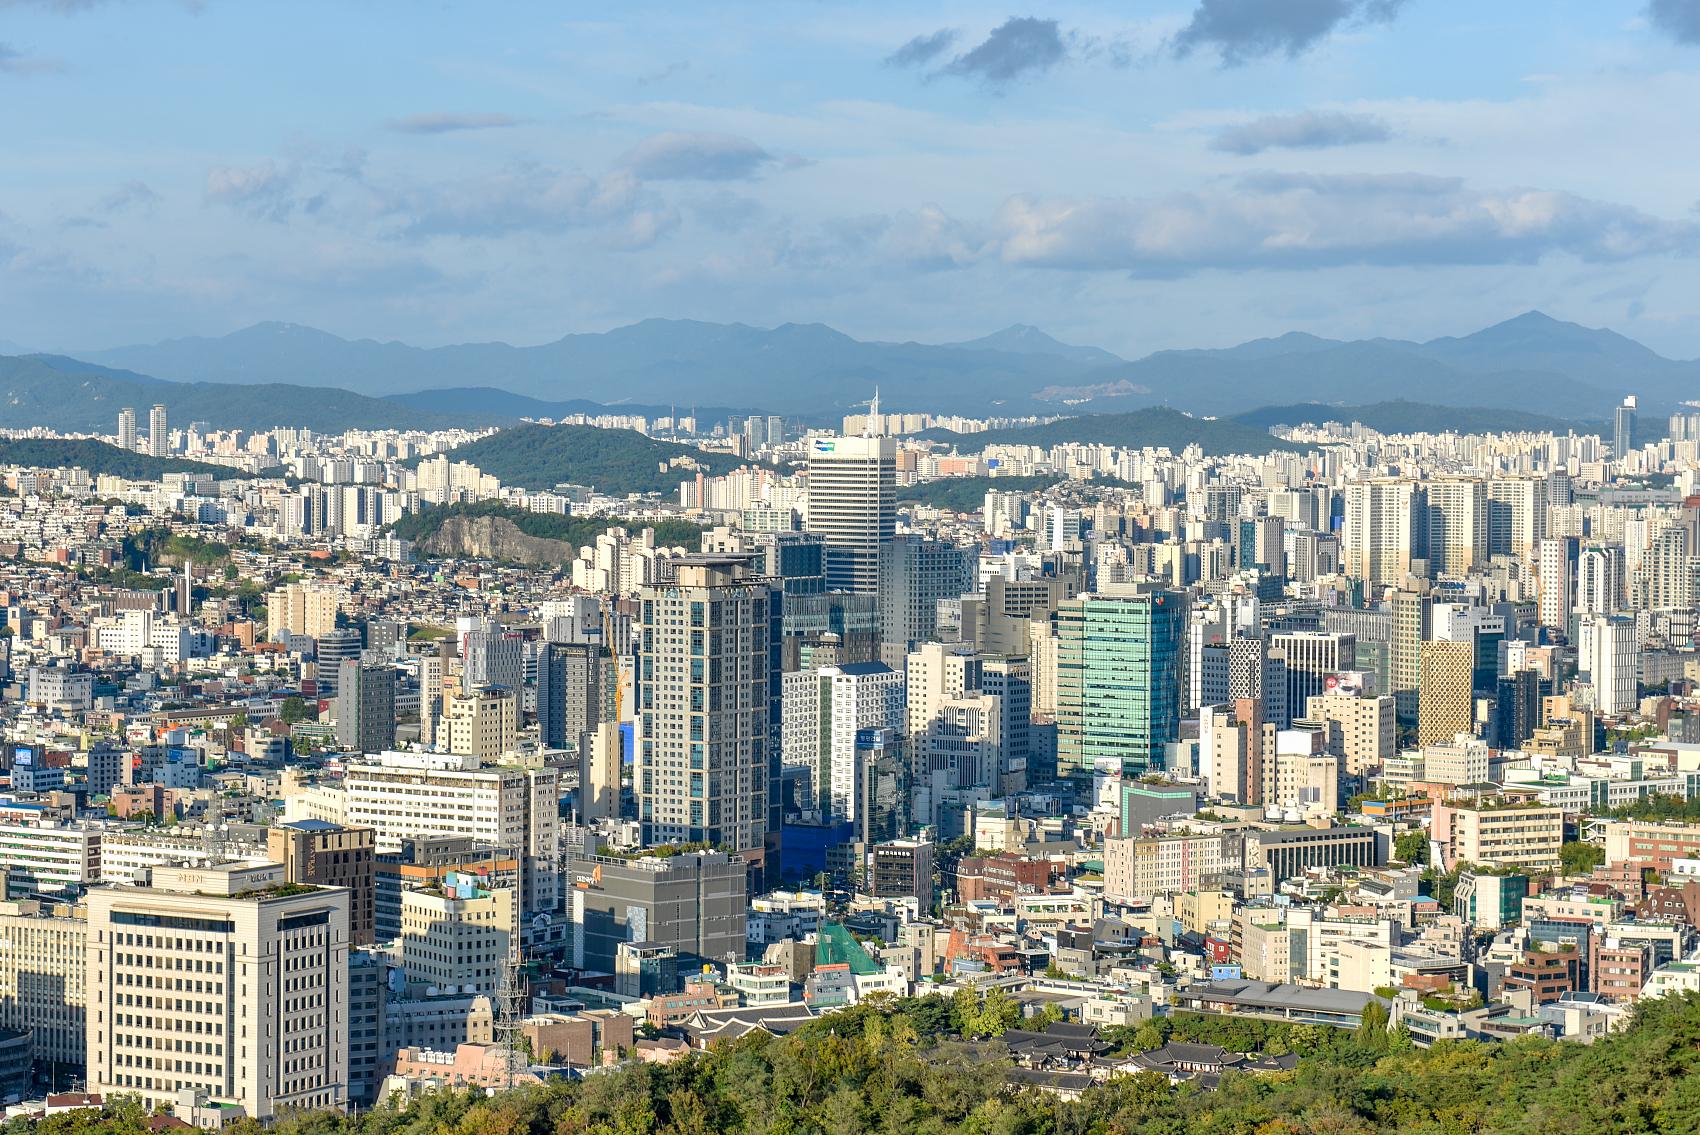 S.Korea's employment declines 277,000 in July